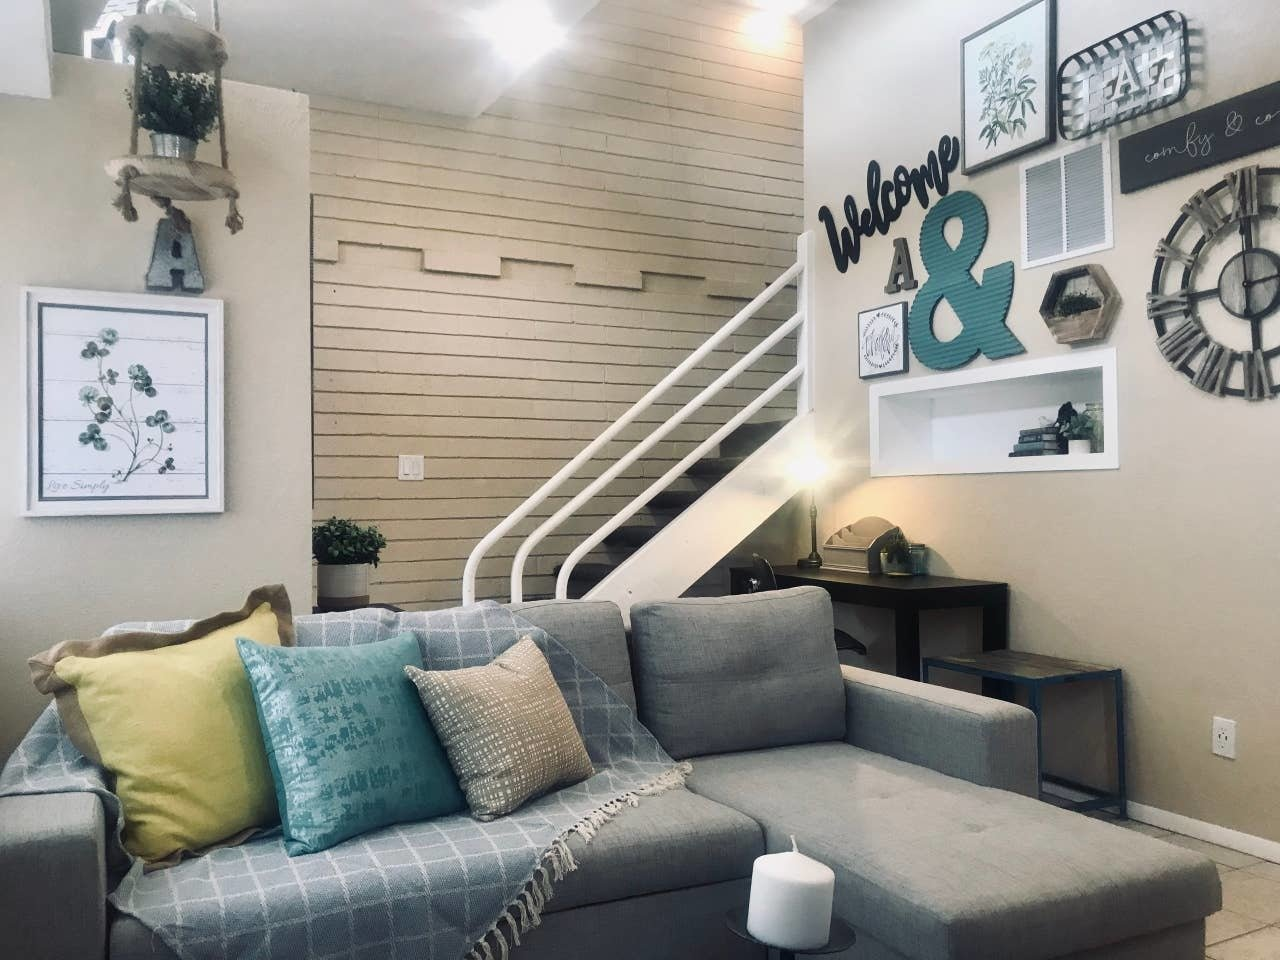 Living Room, Sectional, Ceiling Lighting, Ceramic Tile Floor, and Table Lighting  Nakomis Dwellings